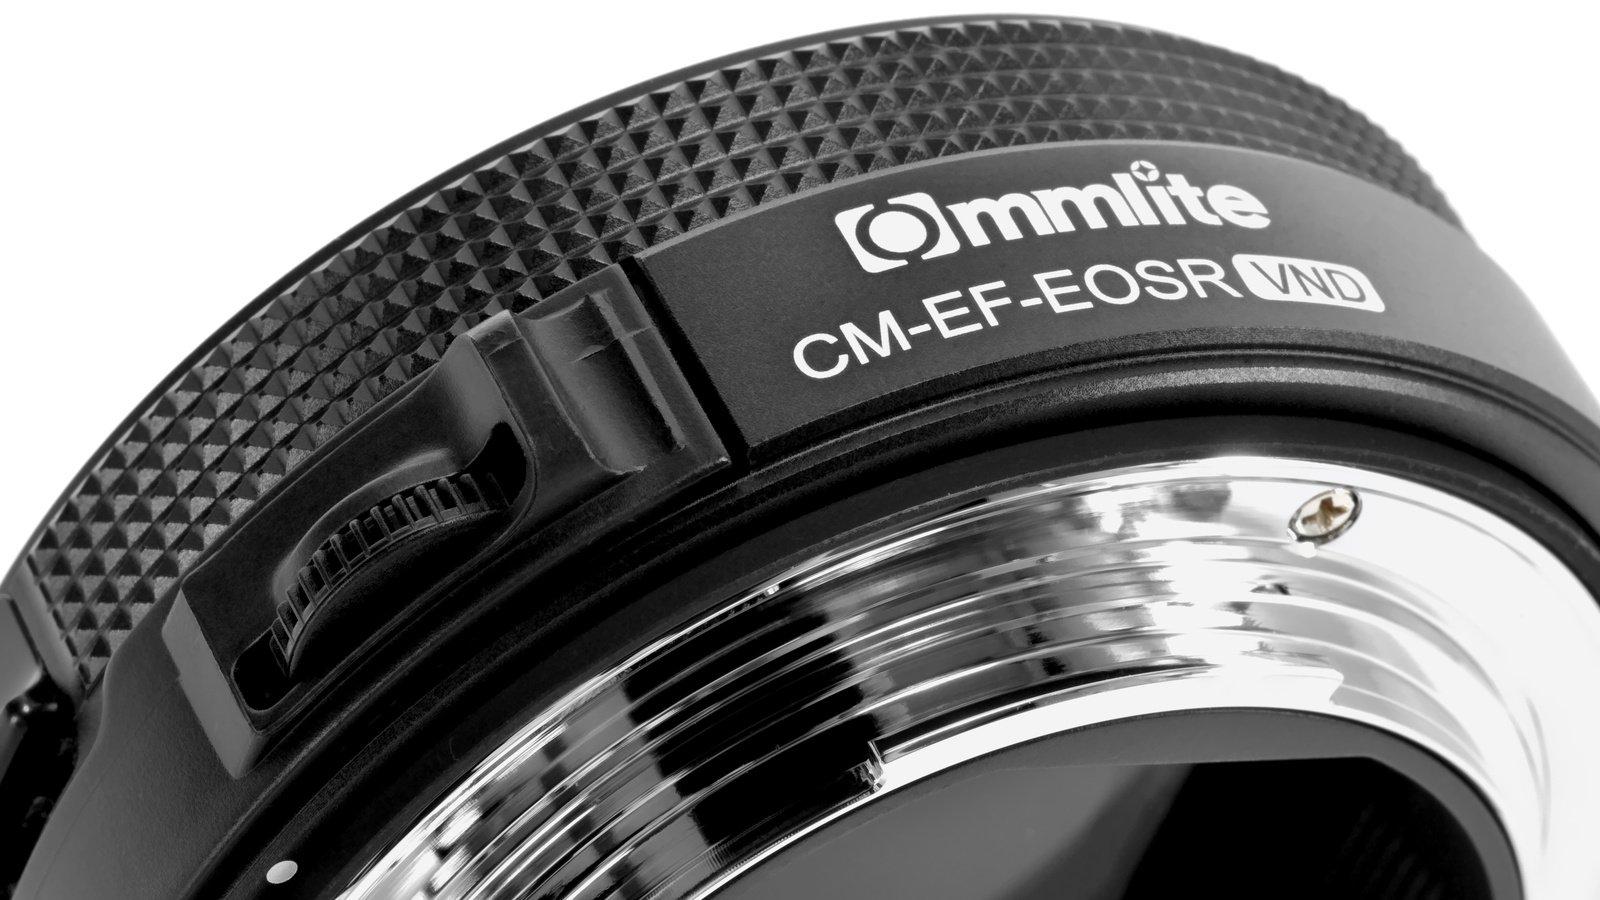 Commlite CM-EF-EOSR VND Canon EF zu EOS R Objektivadapter mit VARI ND Filter Foto Nr. 3